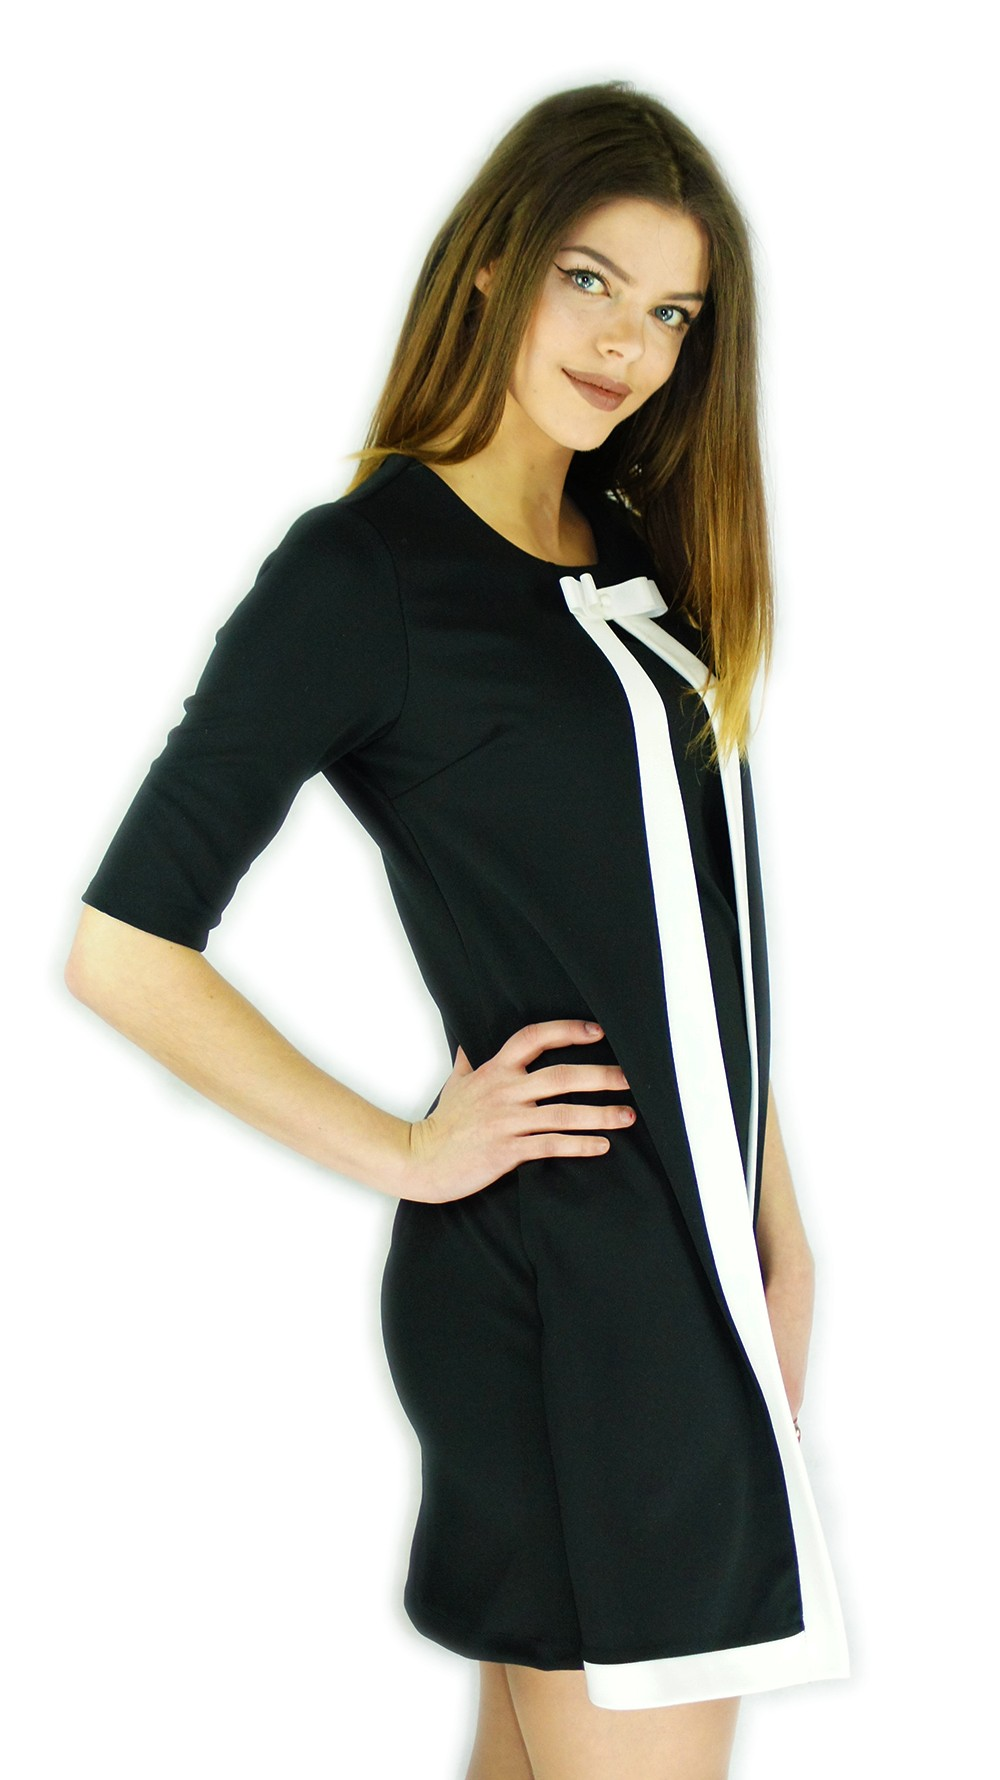 robe de soiree marque italienne robes de soir e. Black Bedroom Furniture Sets. Home Design Ideas